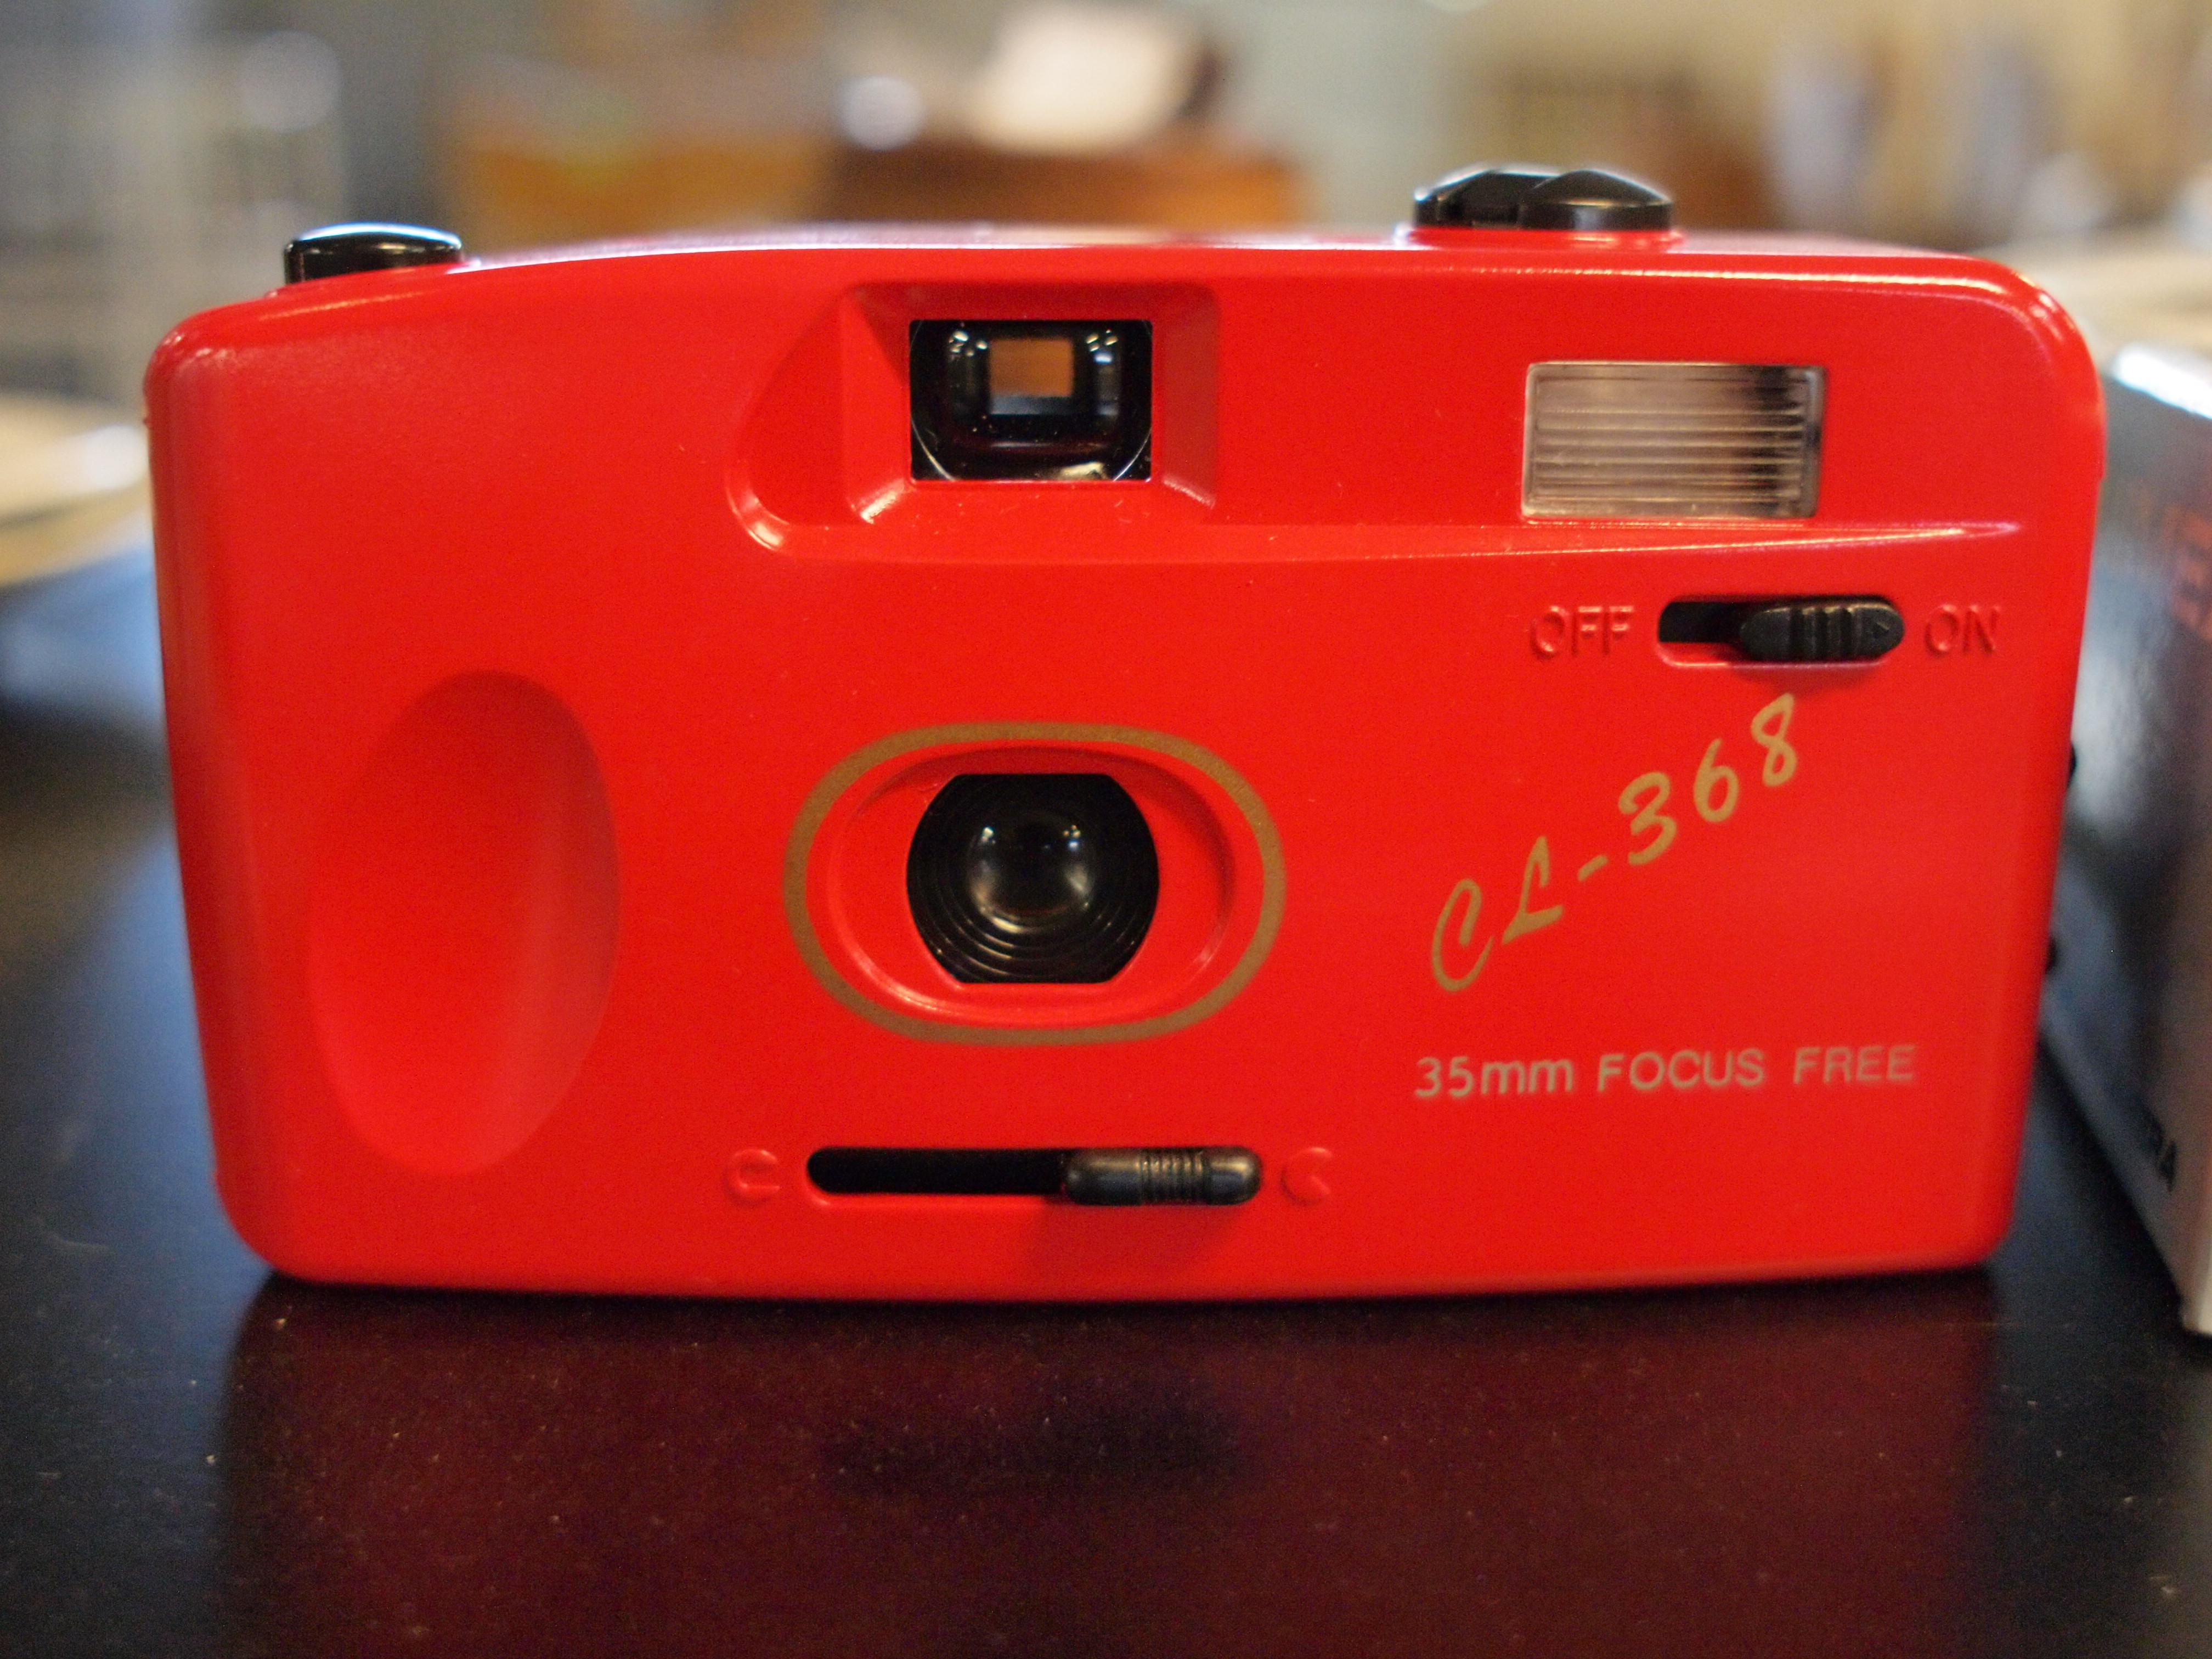 File:CL-368 camera.JPG